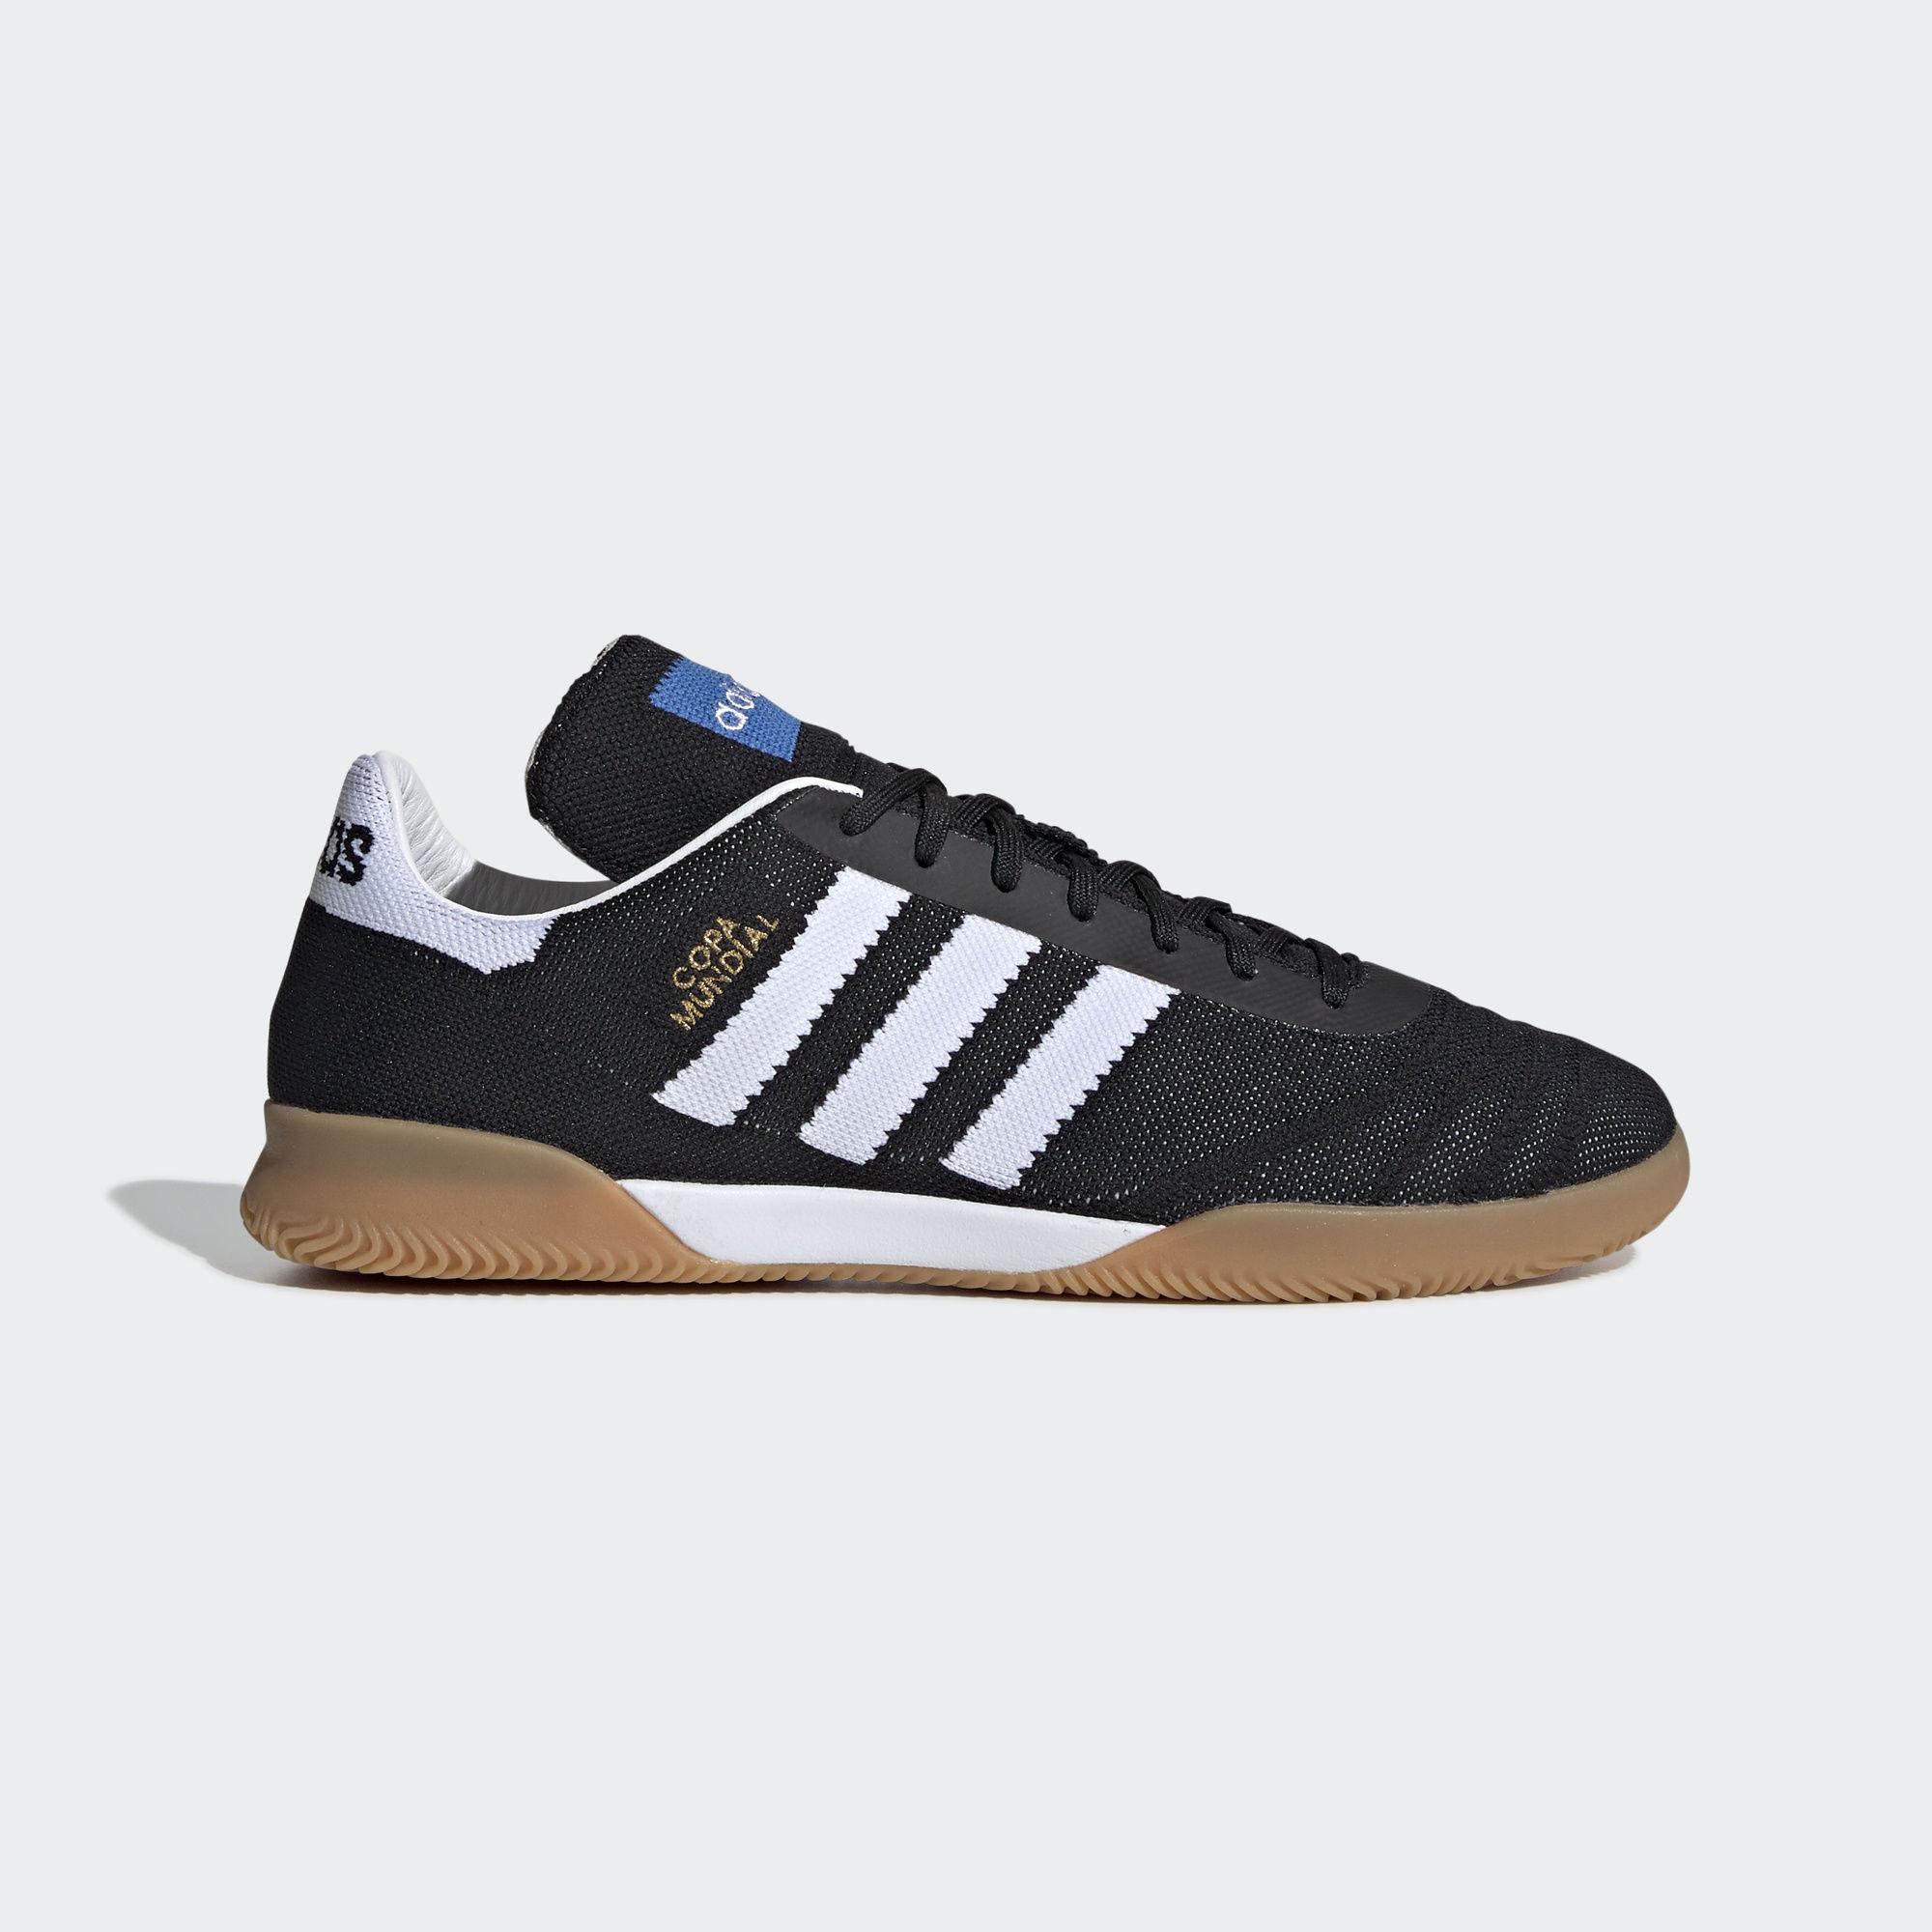 f7b58a88454 adidas Originals Adidas Copa Mundial 70 Years Tr Core Black  Ftw ...